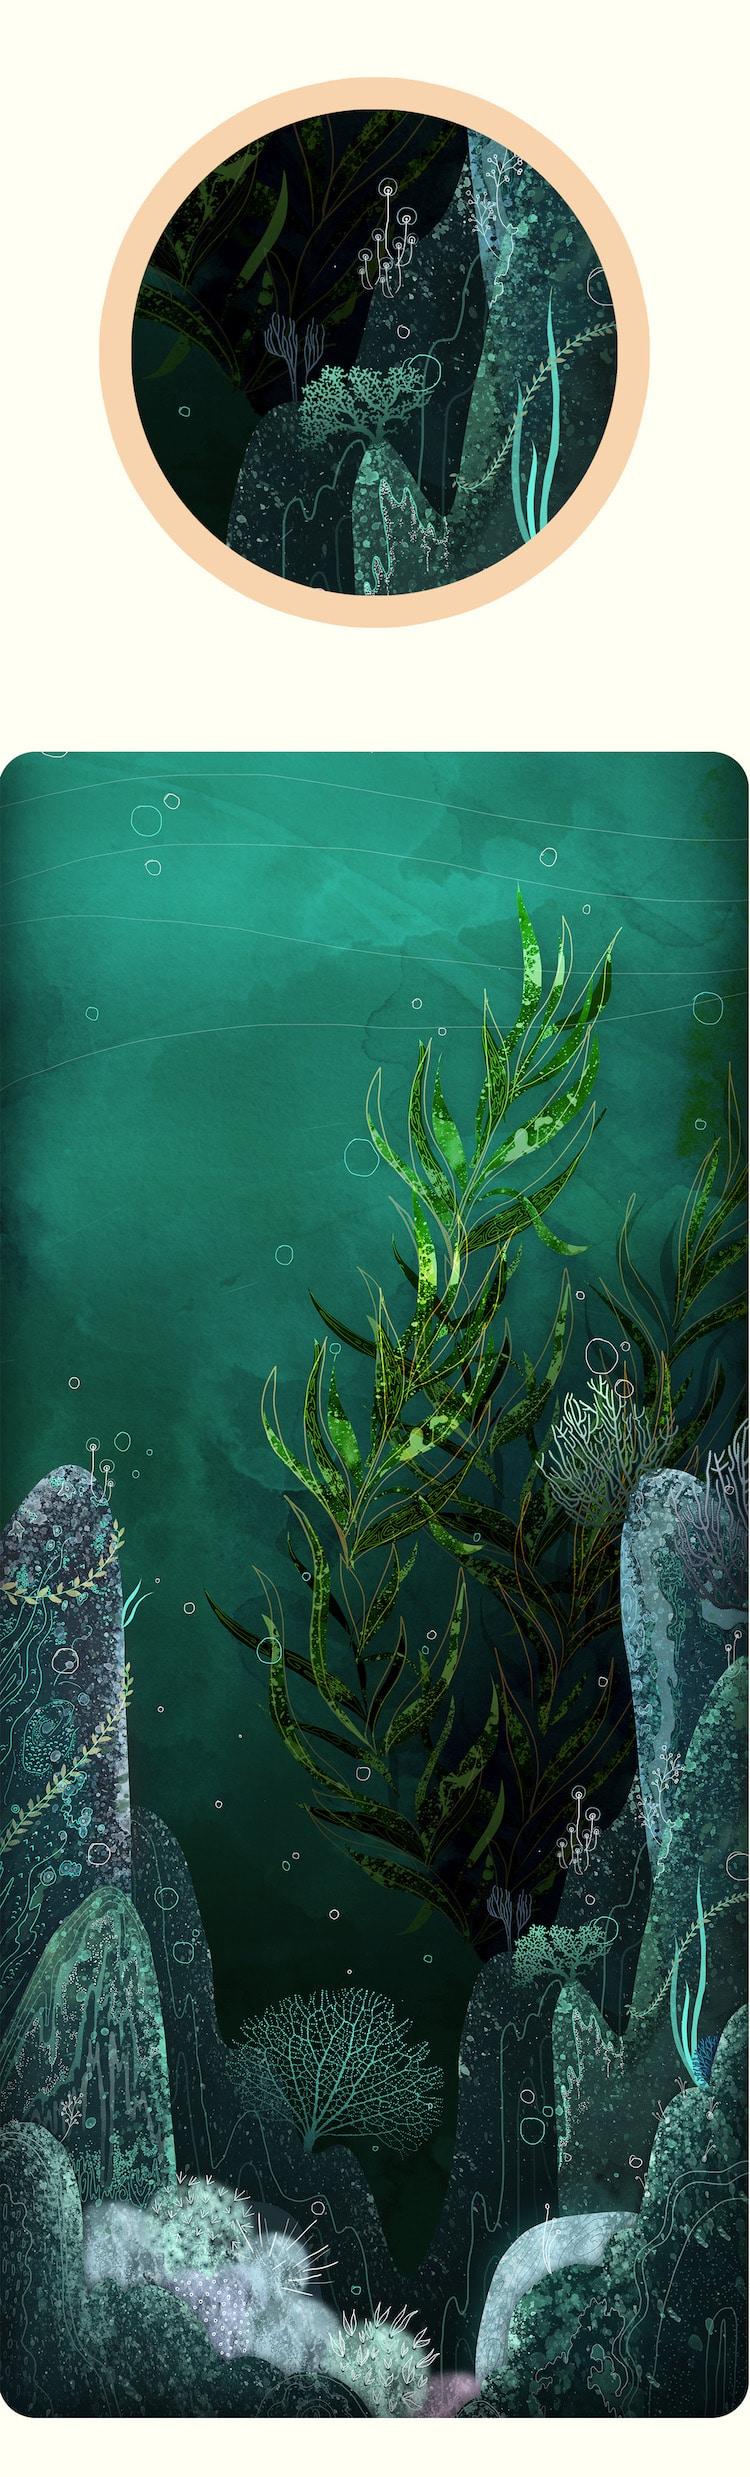 svabhu kohli nature illustration